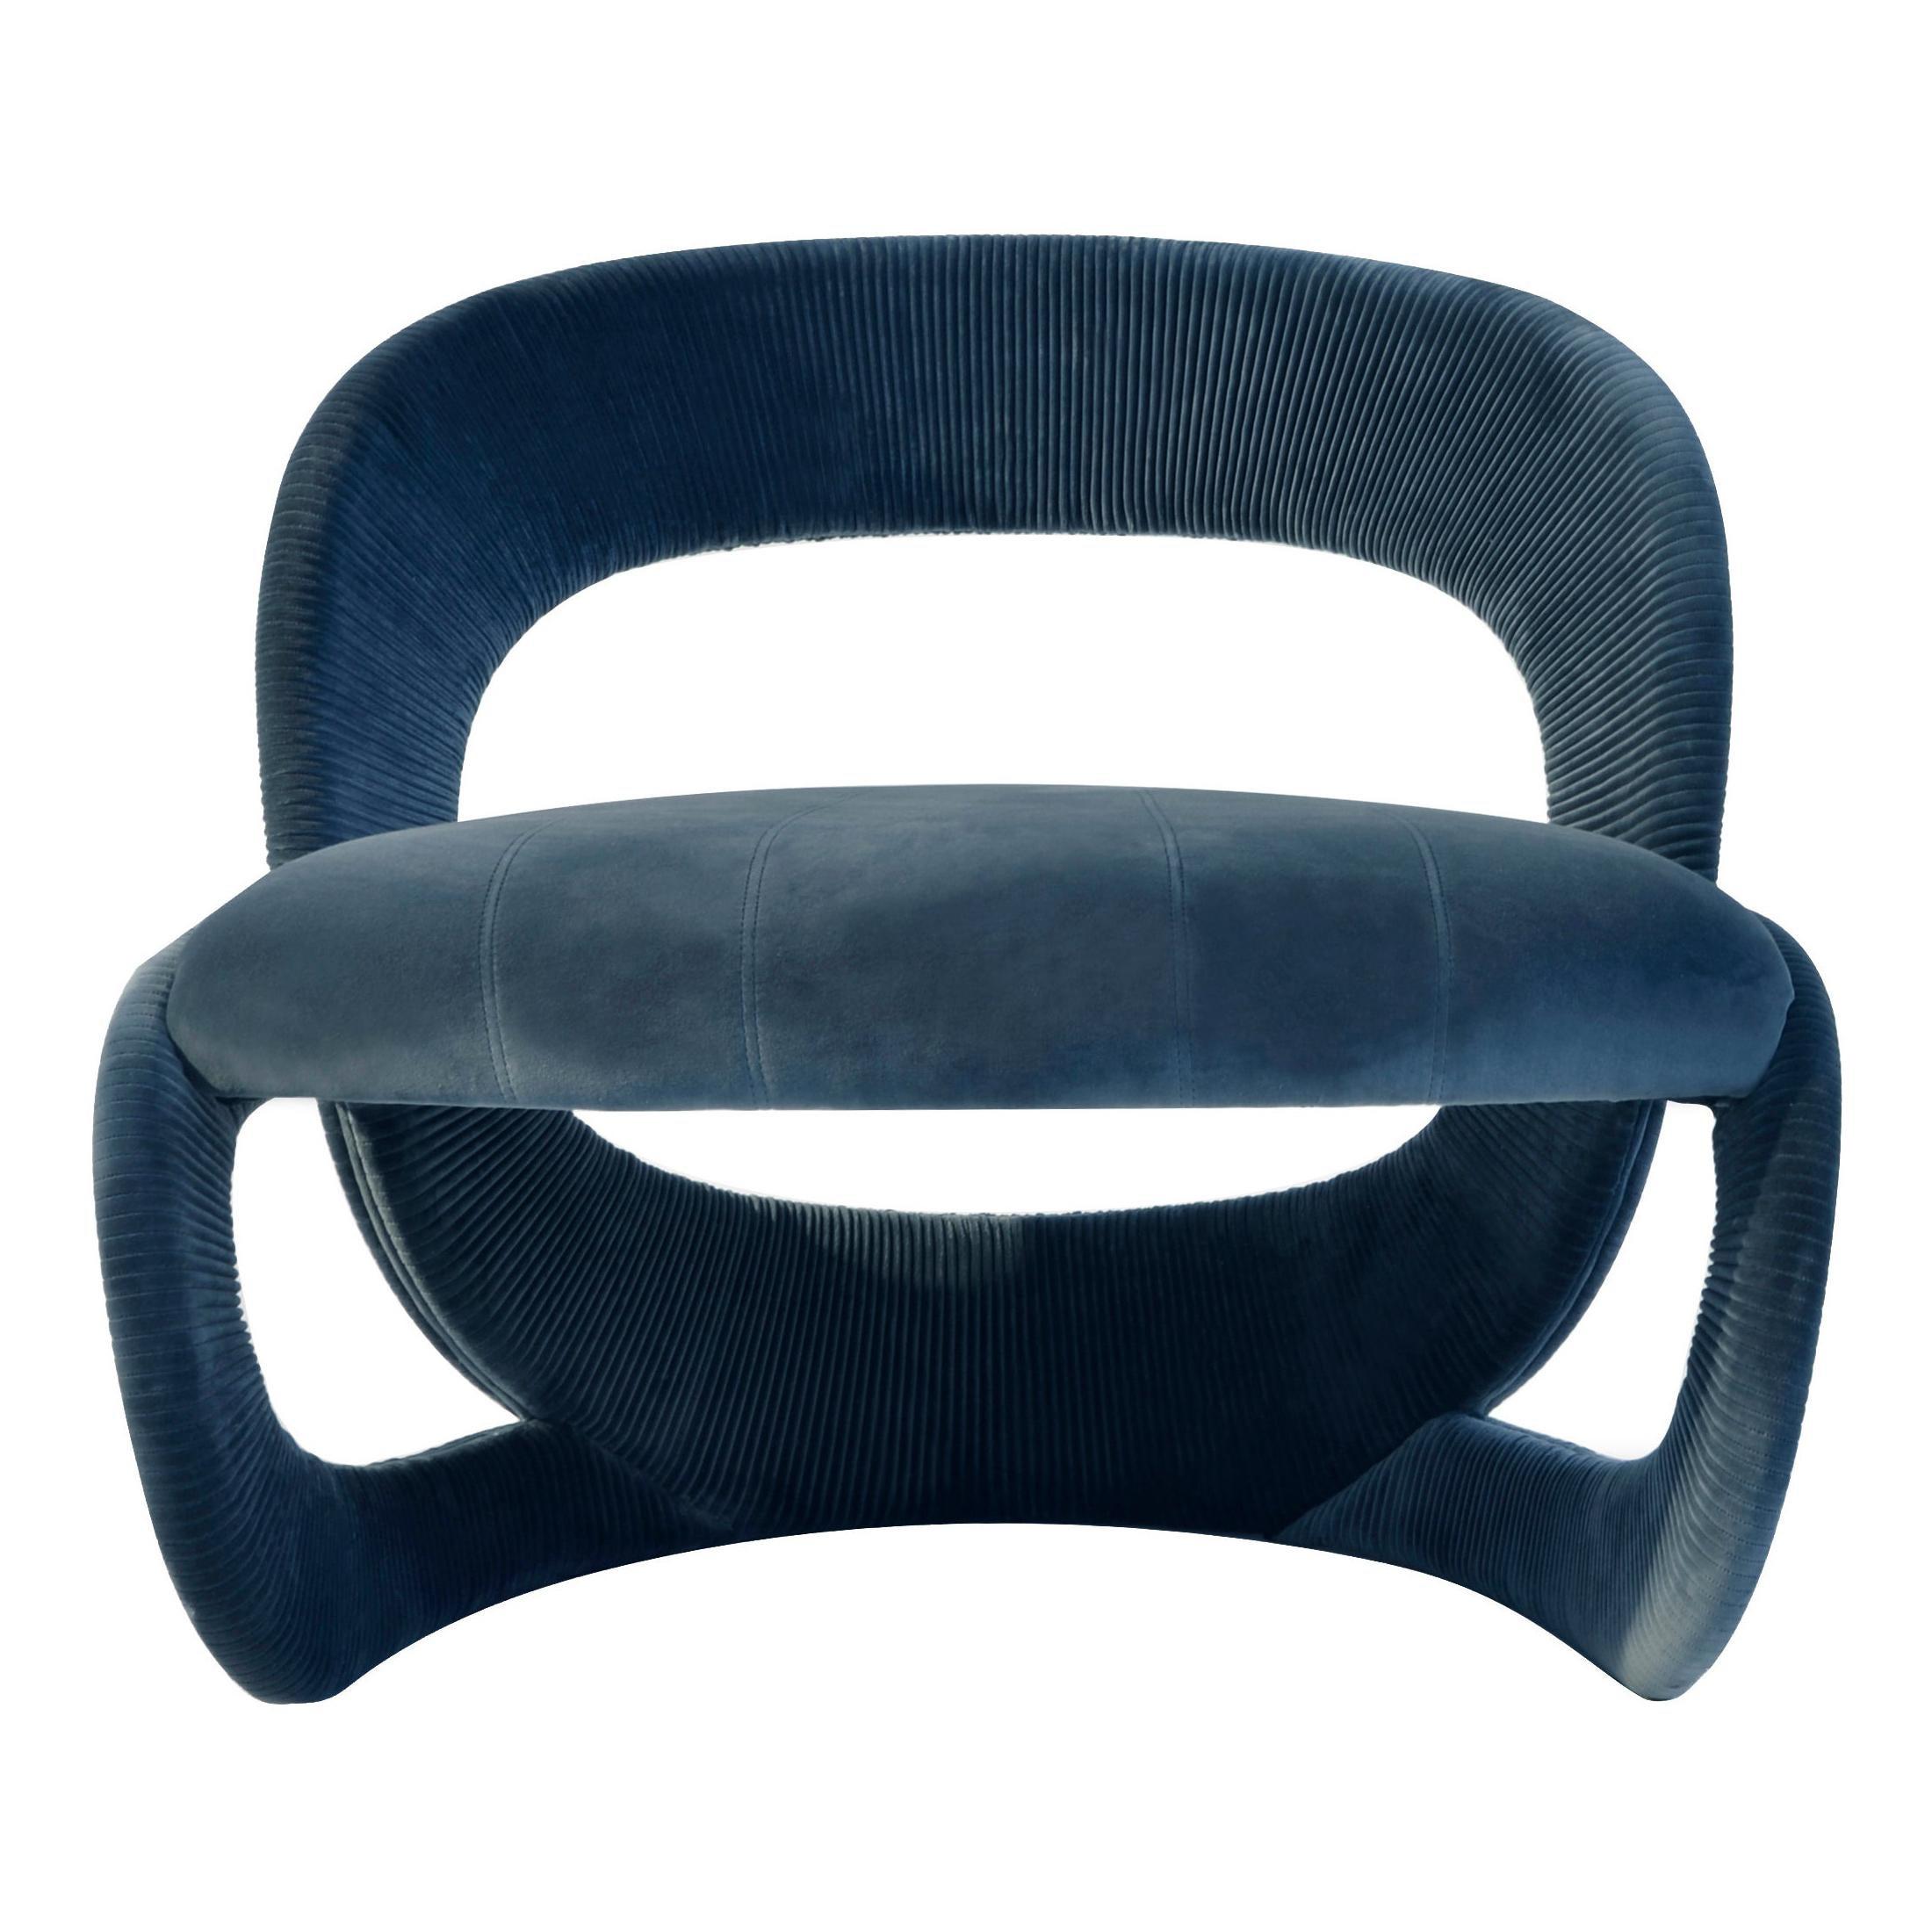 Contemporary Armchair by Hessentia in Blue Velvet